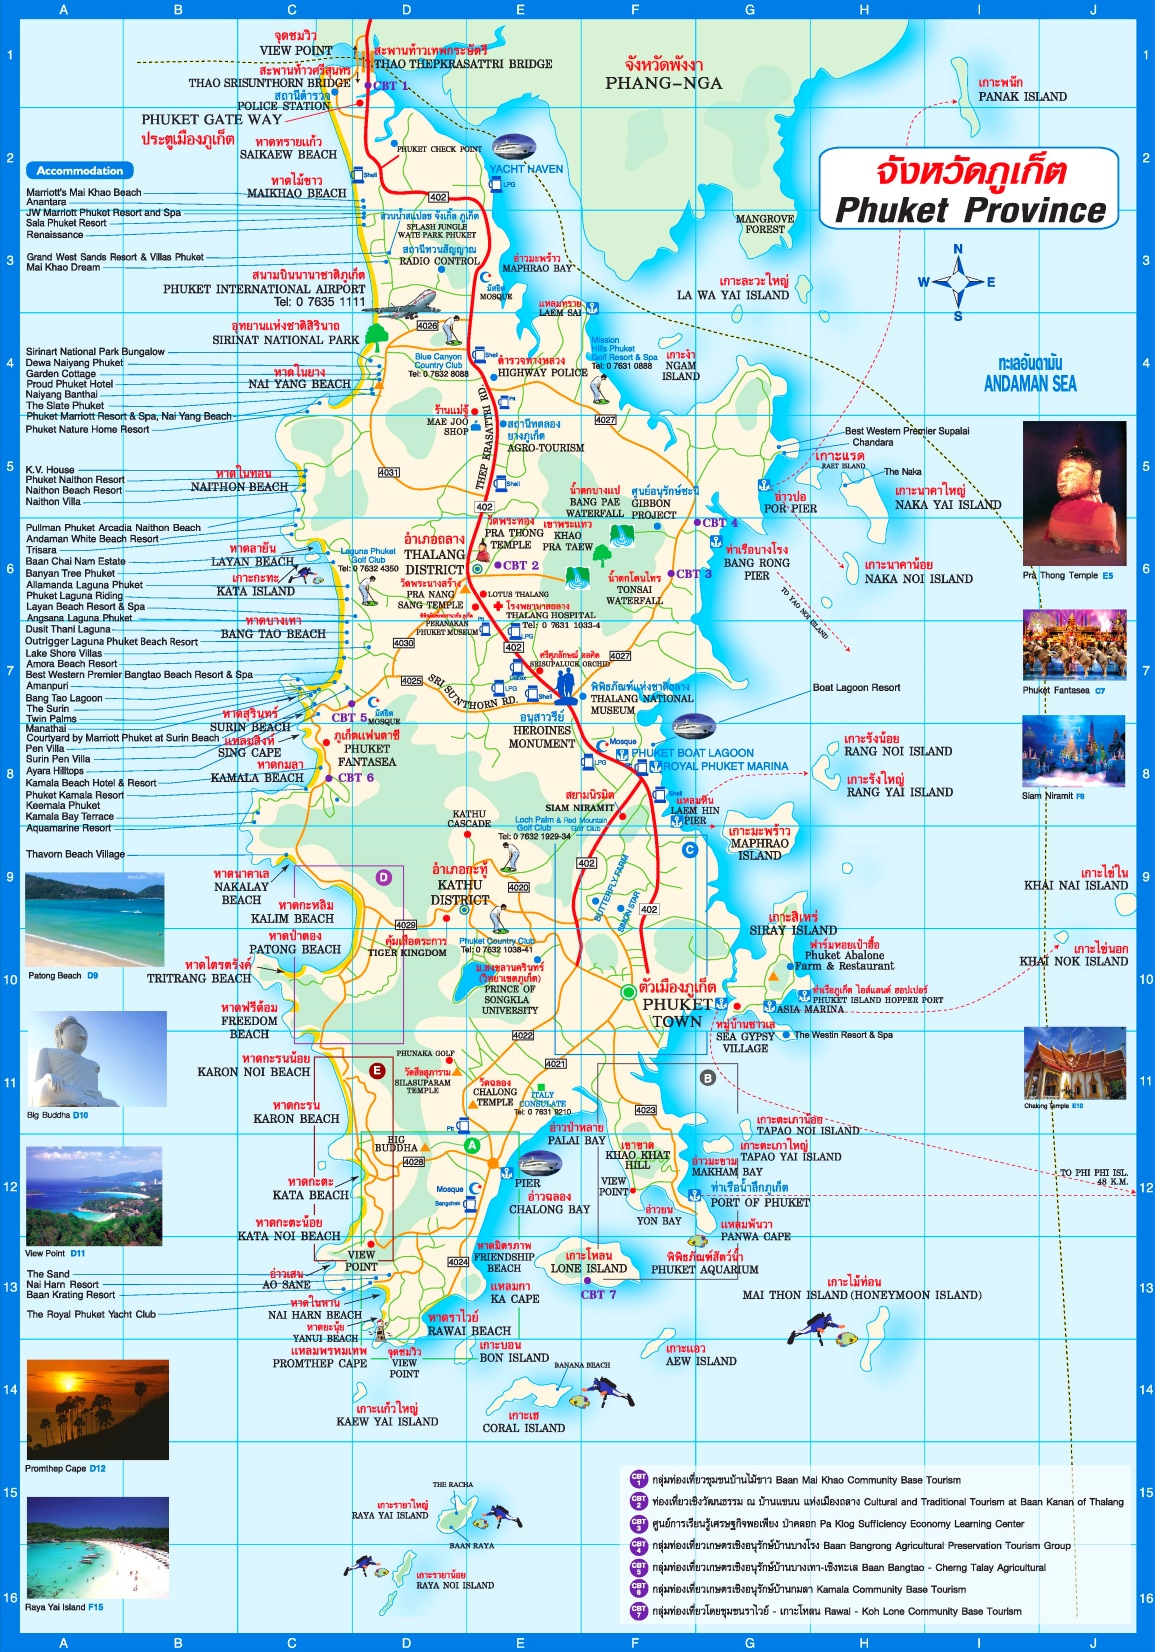 Map Of Phuket Phuket tourist map Map Of Phuket